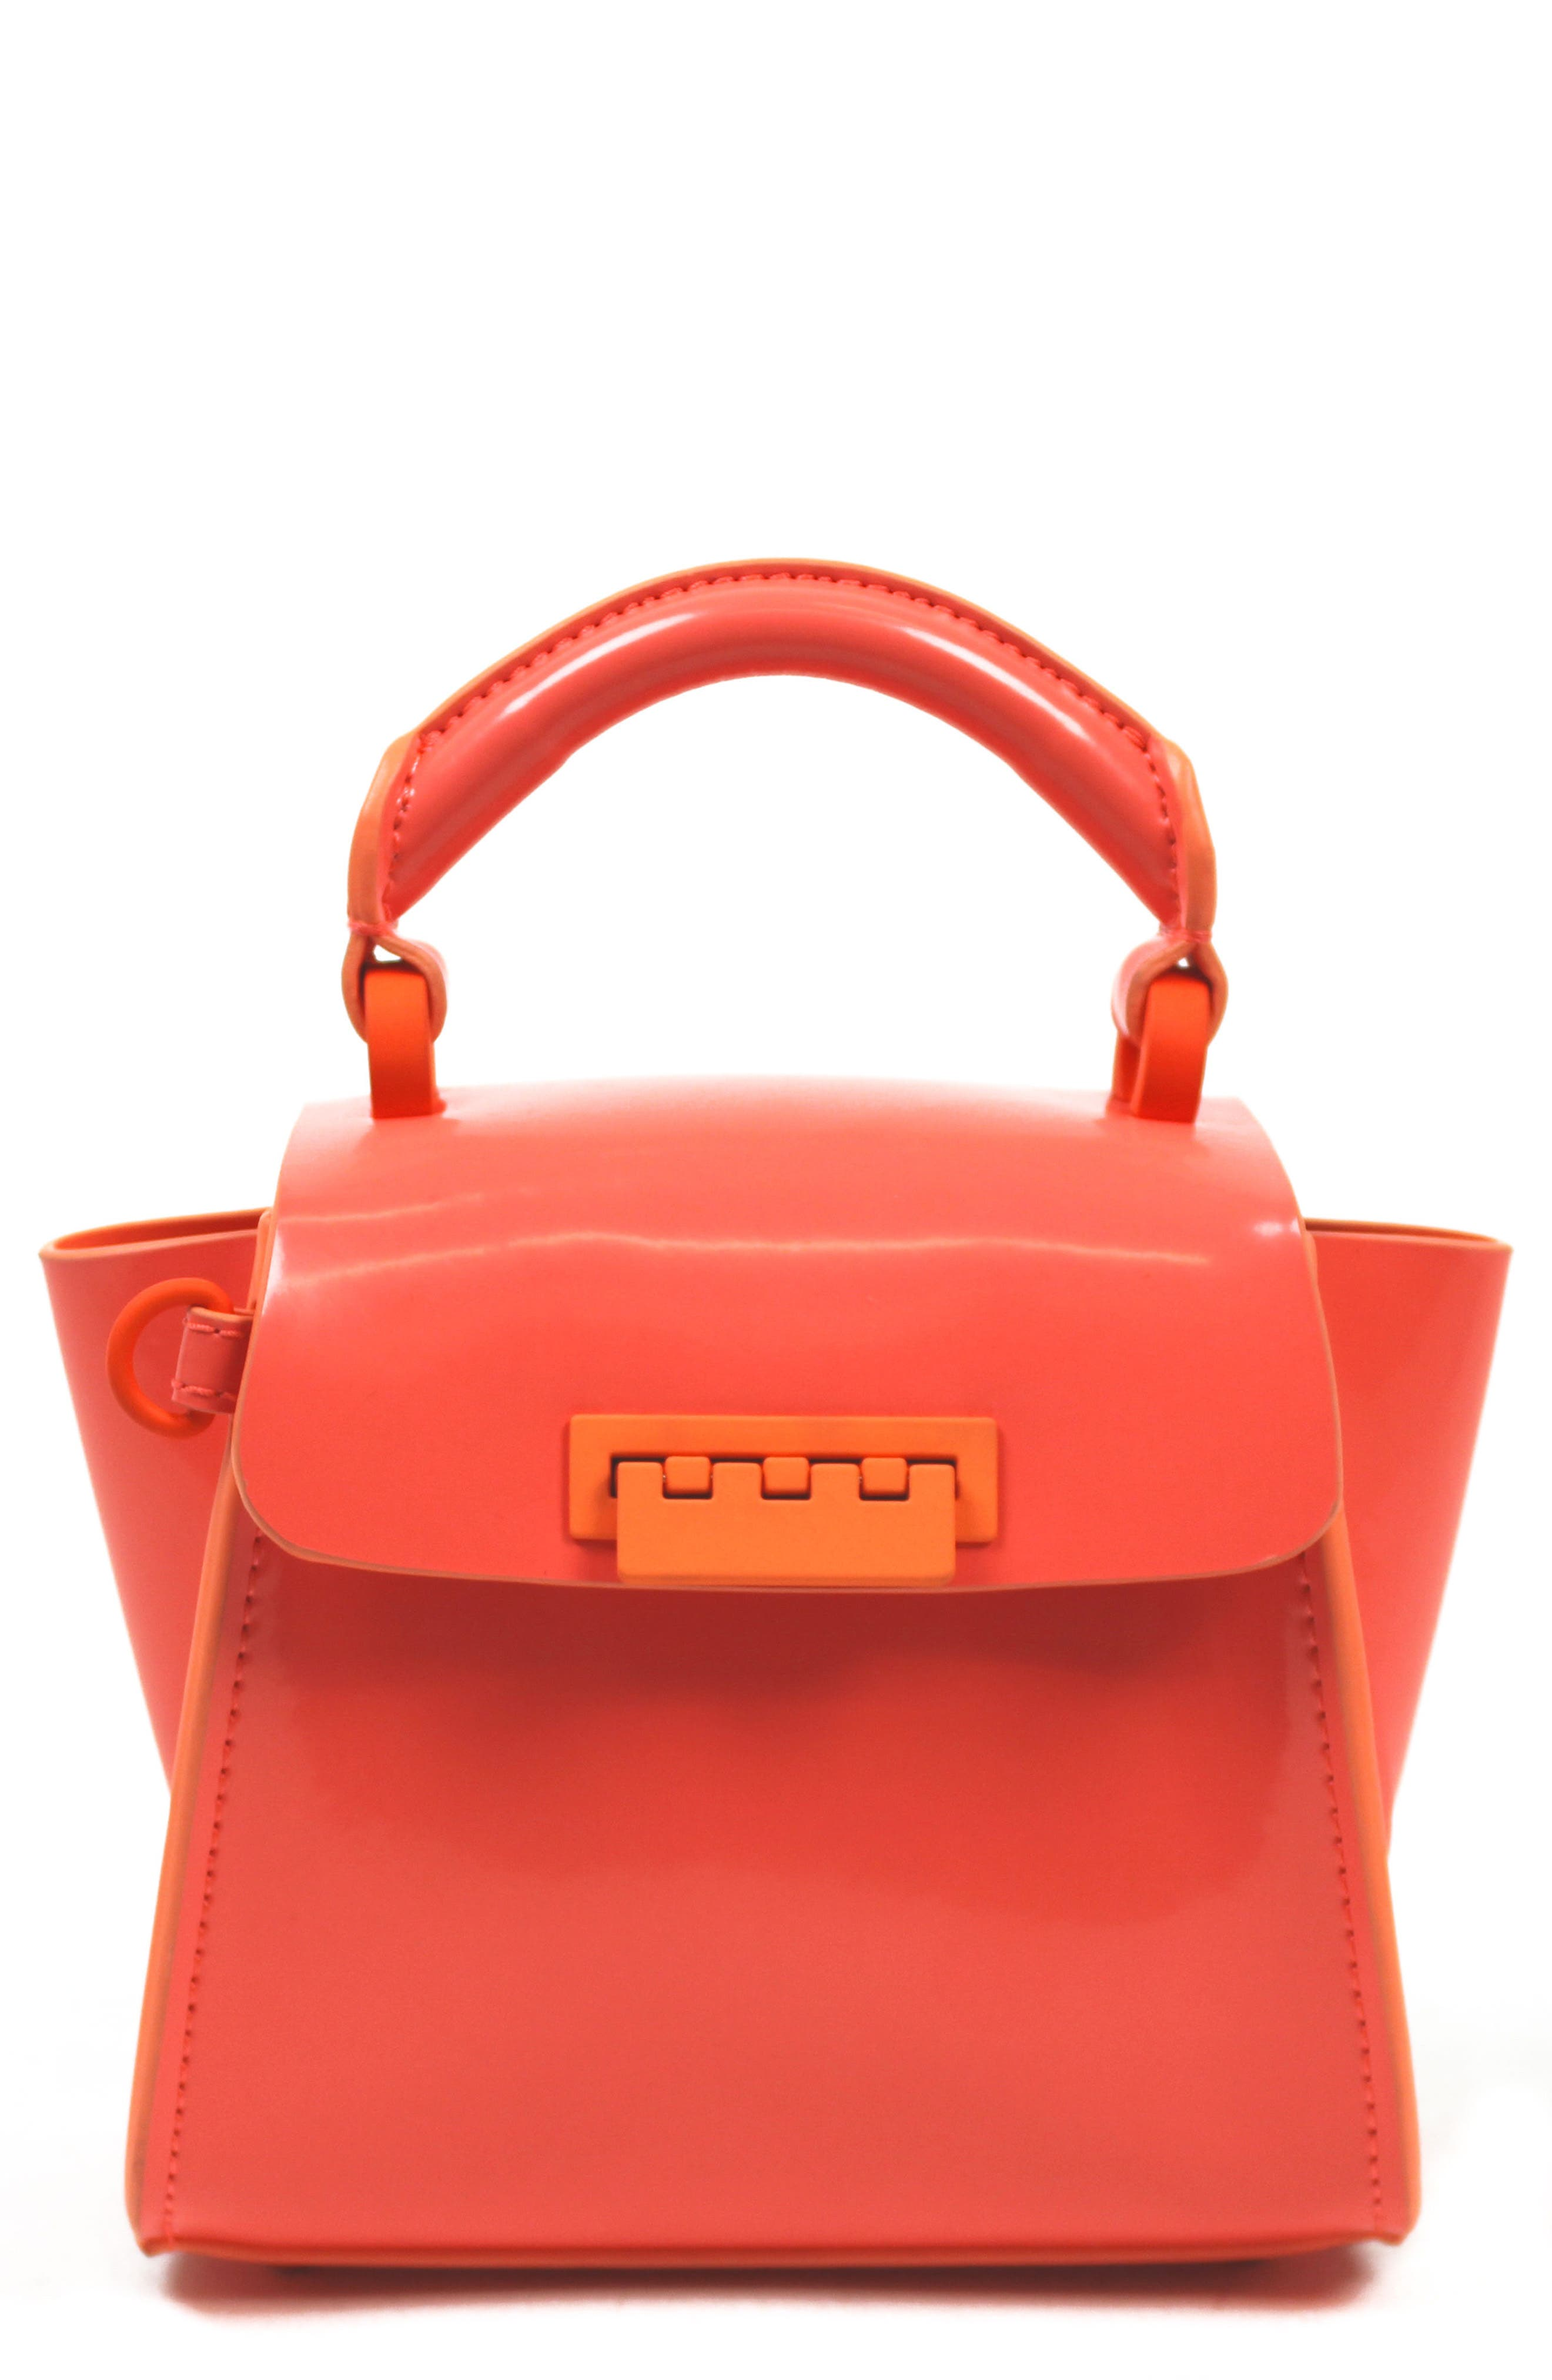 ZAC Zac Posen Eartha Iconic Patent Leather Mini Bag